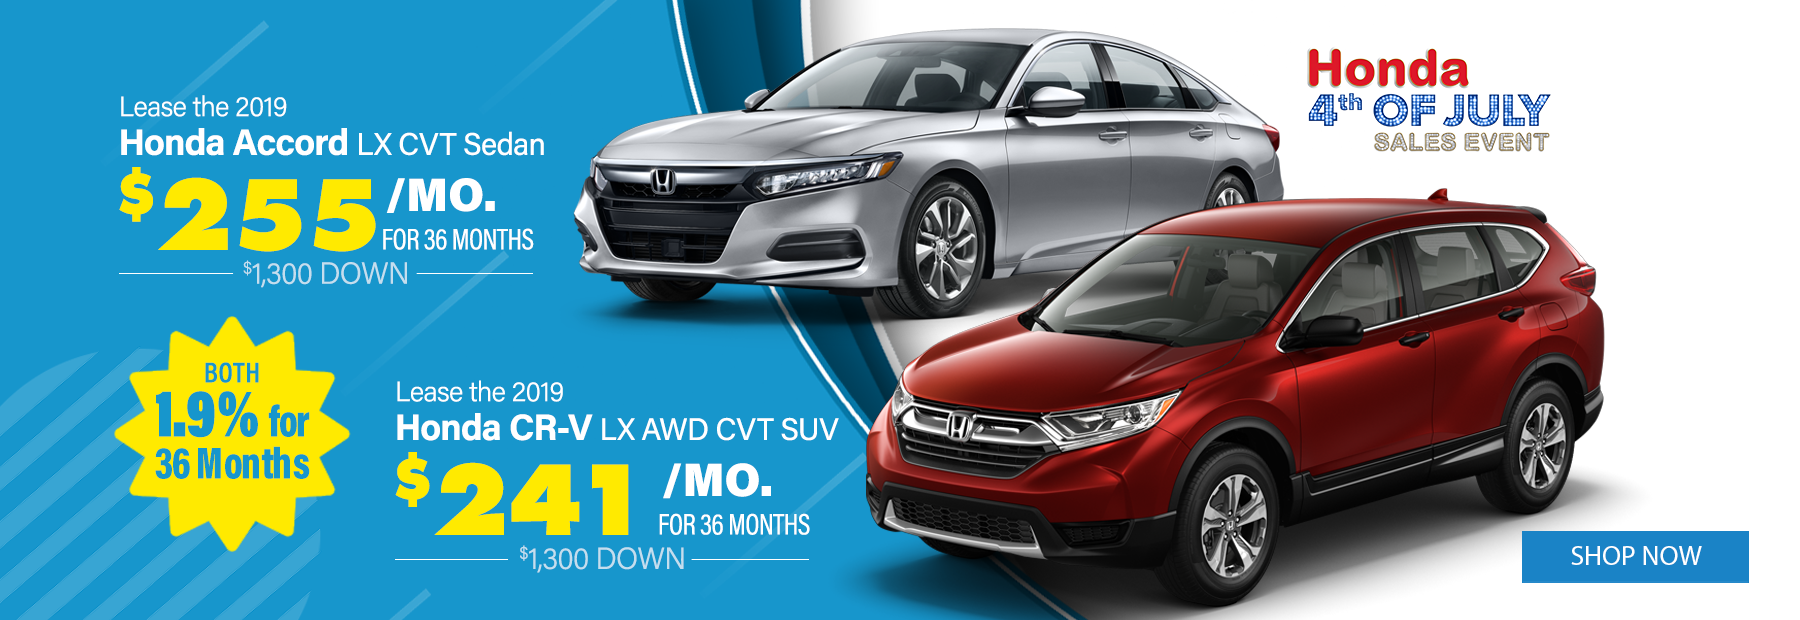 new-honda-accord-crv-lease-deals-cincinnati-ohio-kings-automall